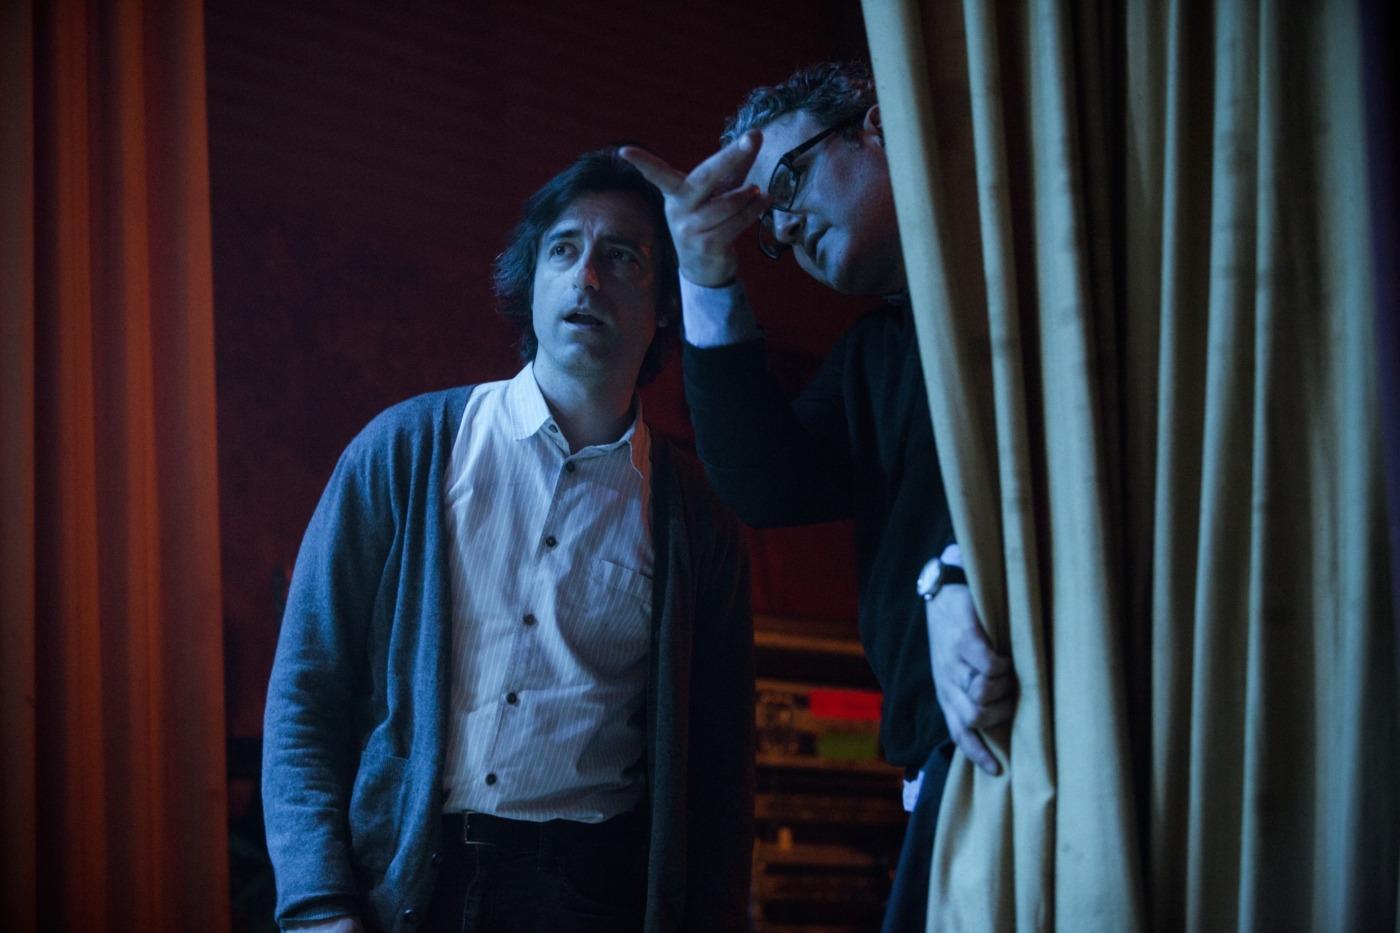 Noah Baumbach on set for 'Mistress America'